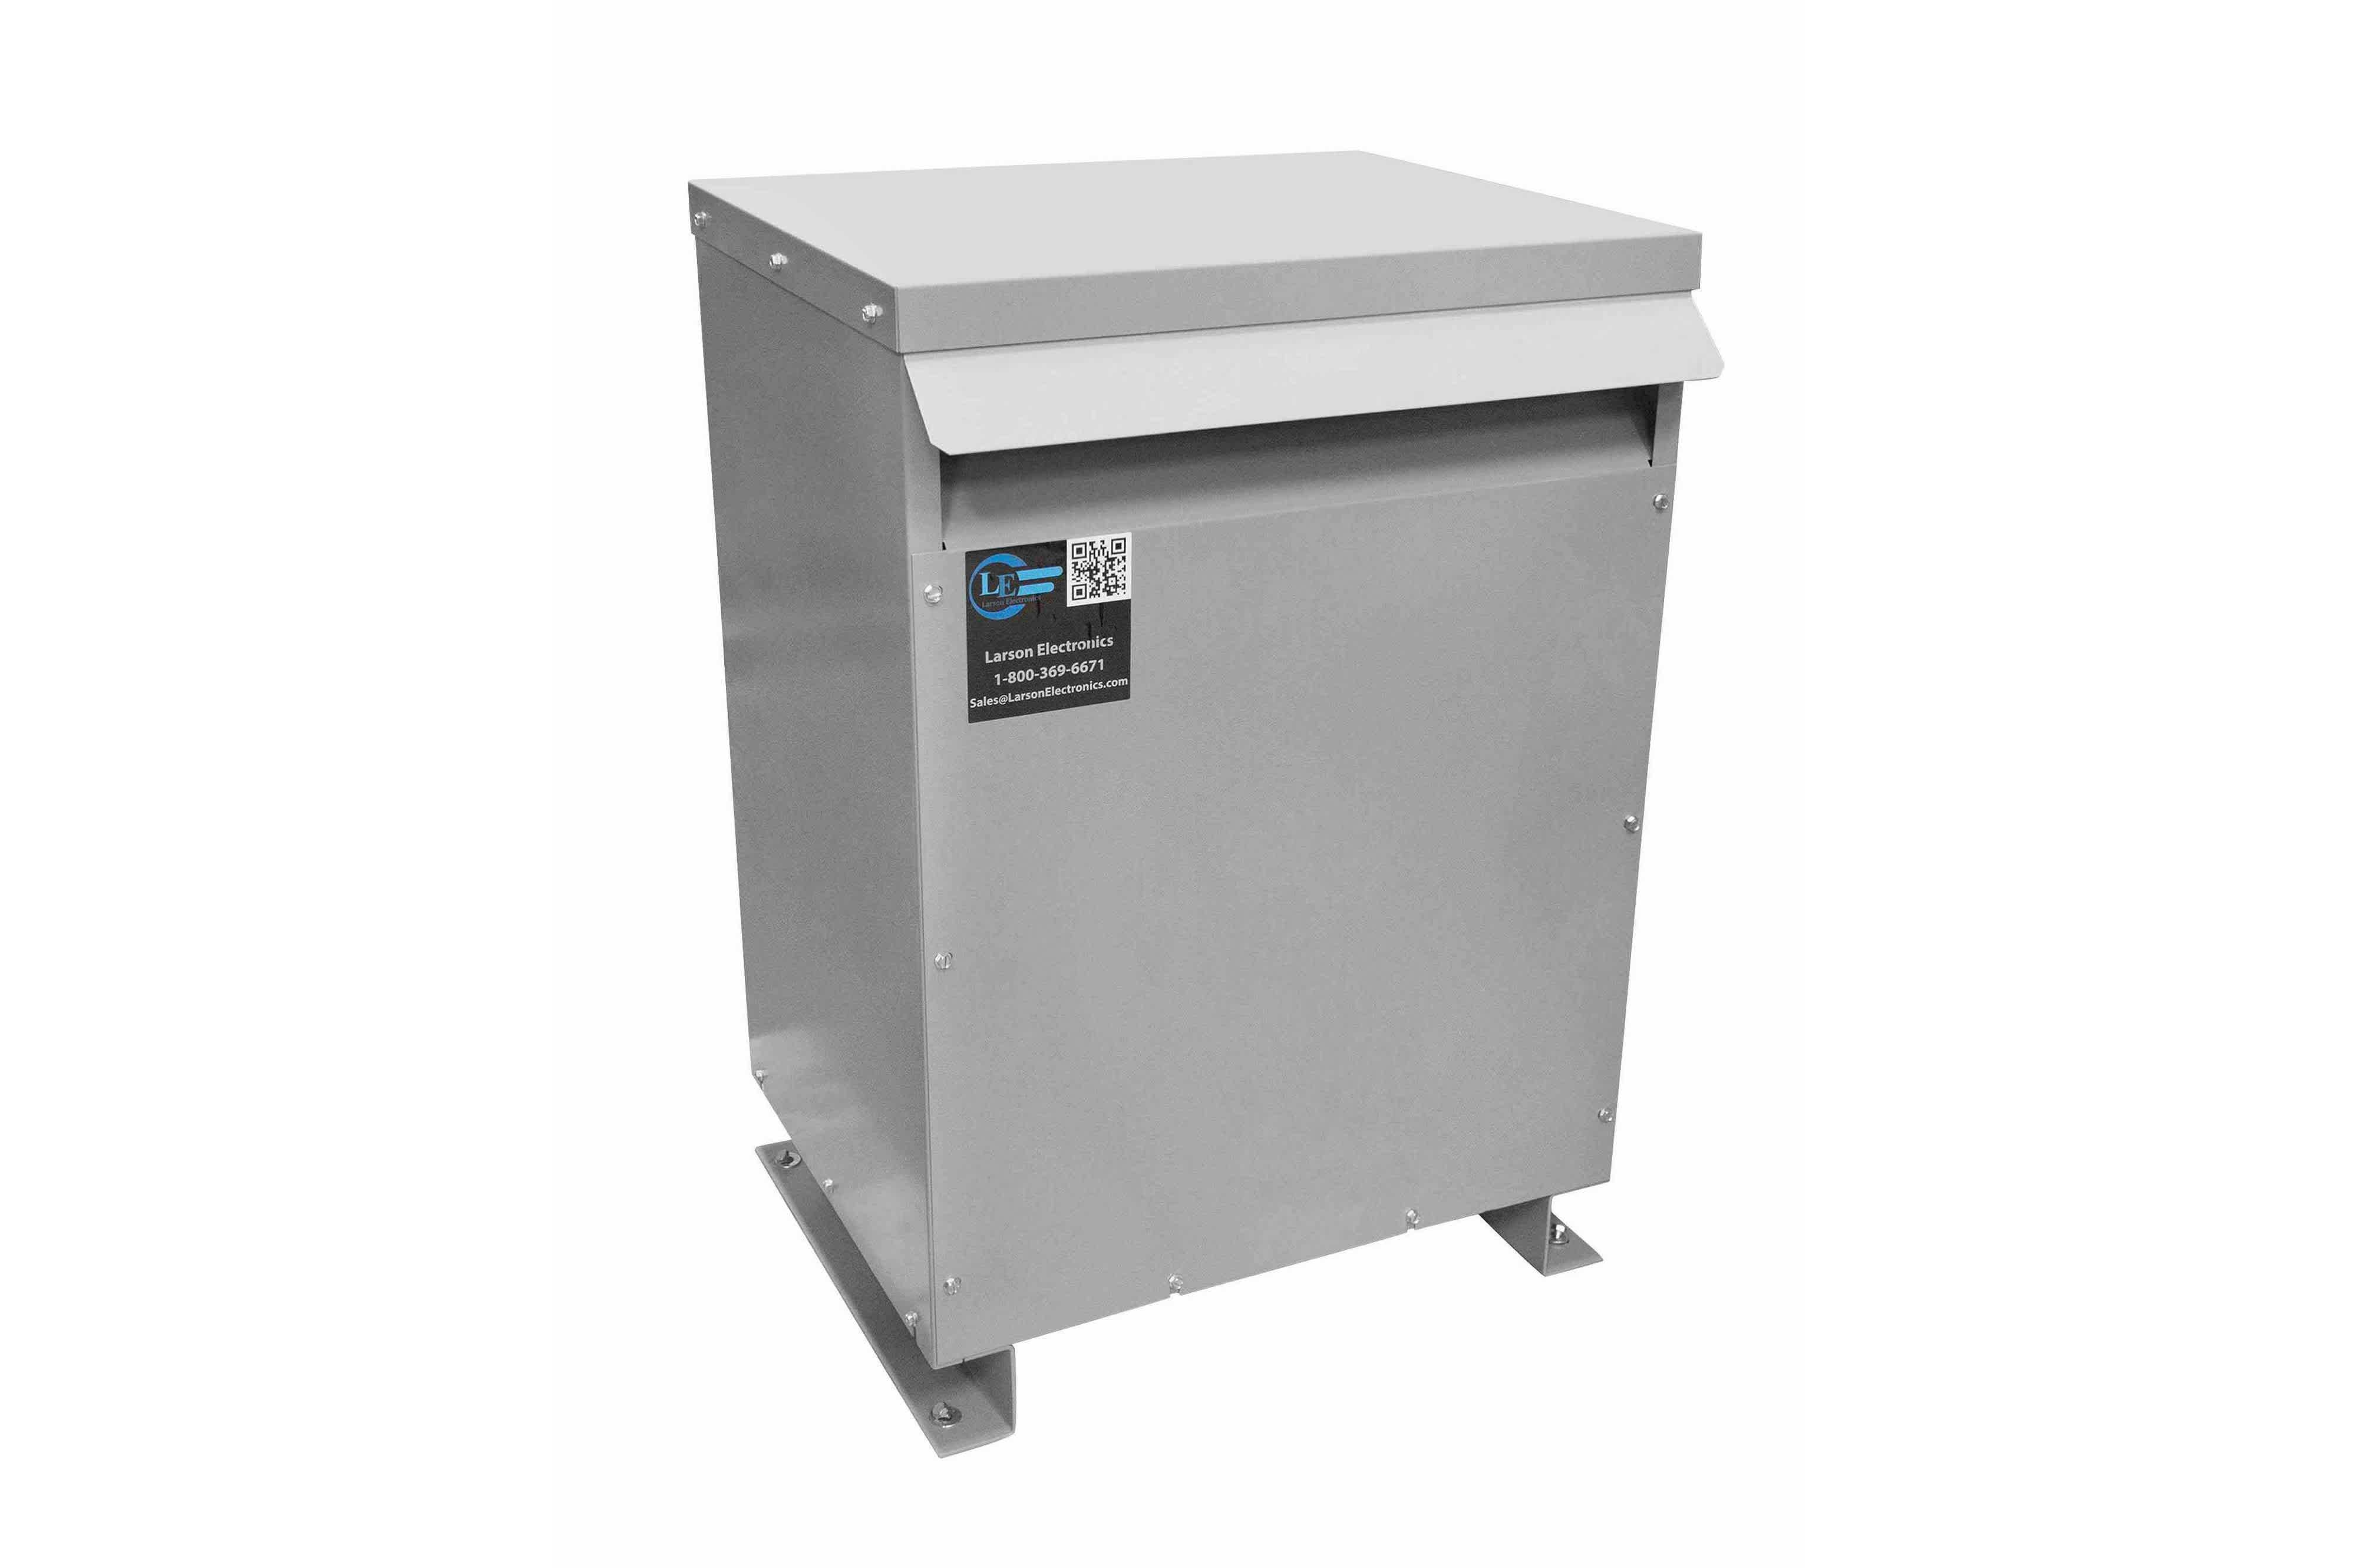 225 kVA 3PH Isolation Transformer, 415V Wye Primary, 600V Delta Secondary, N3R, Ventilated, 60 Hz